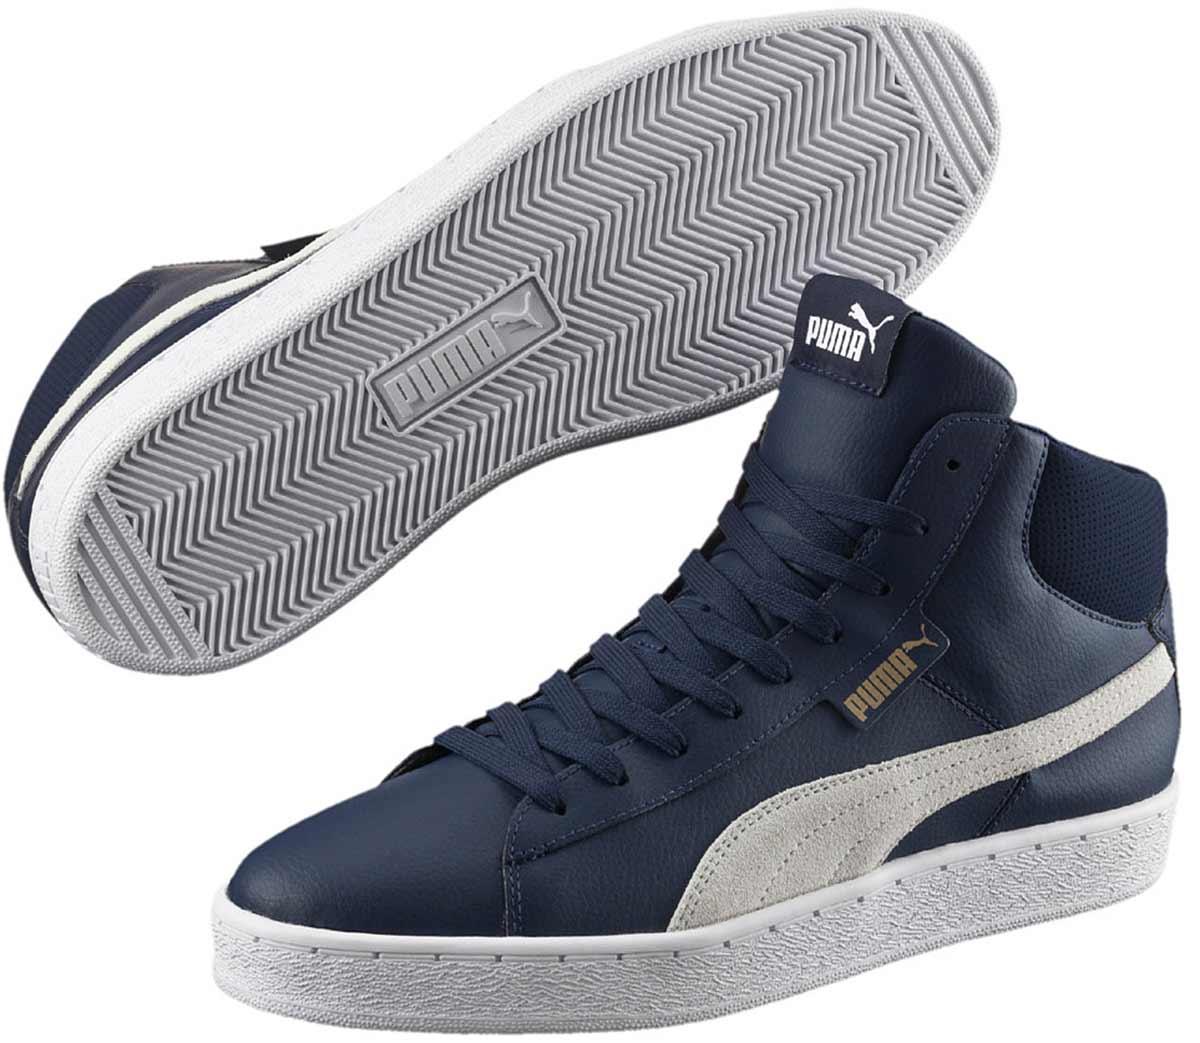 puma winterstiefel sneaker schuhe boots rebound. Black Bedroom Furniture Sets. Home Design Ideas